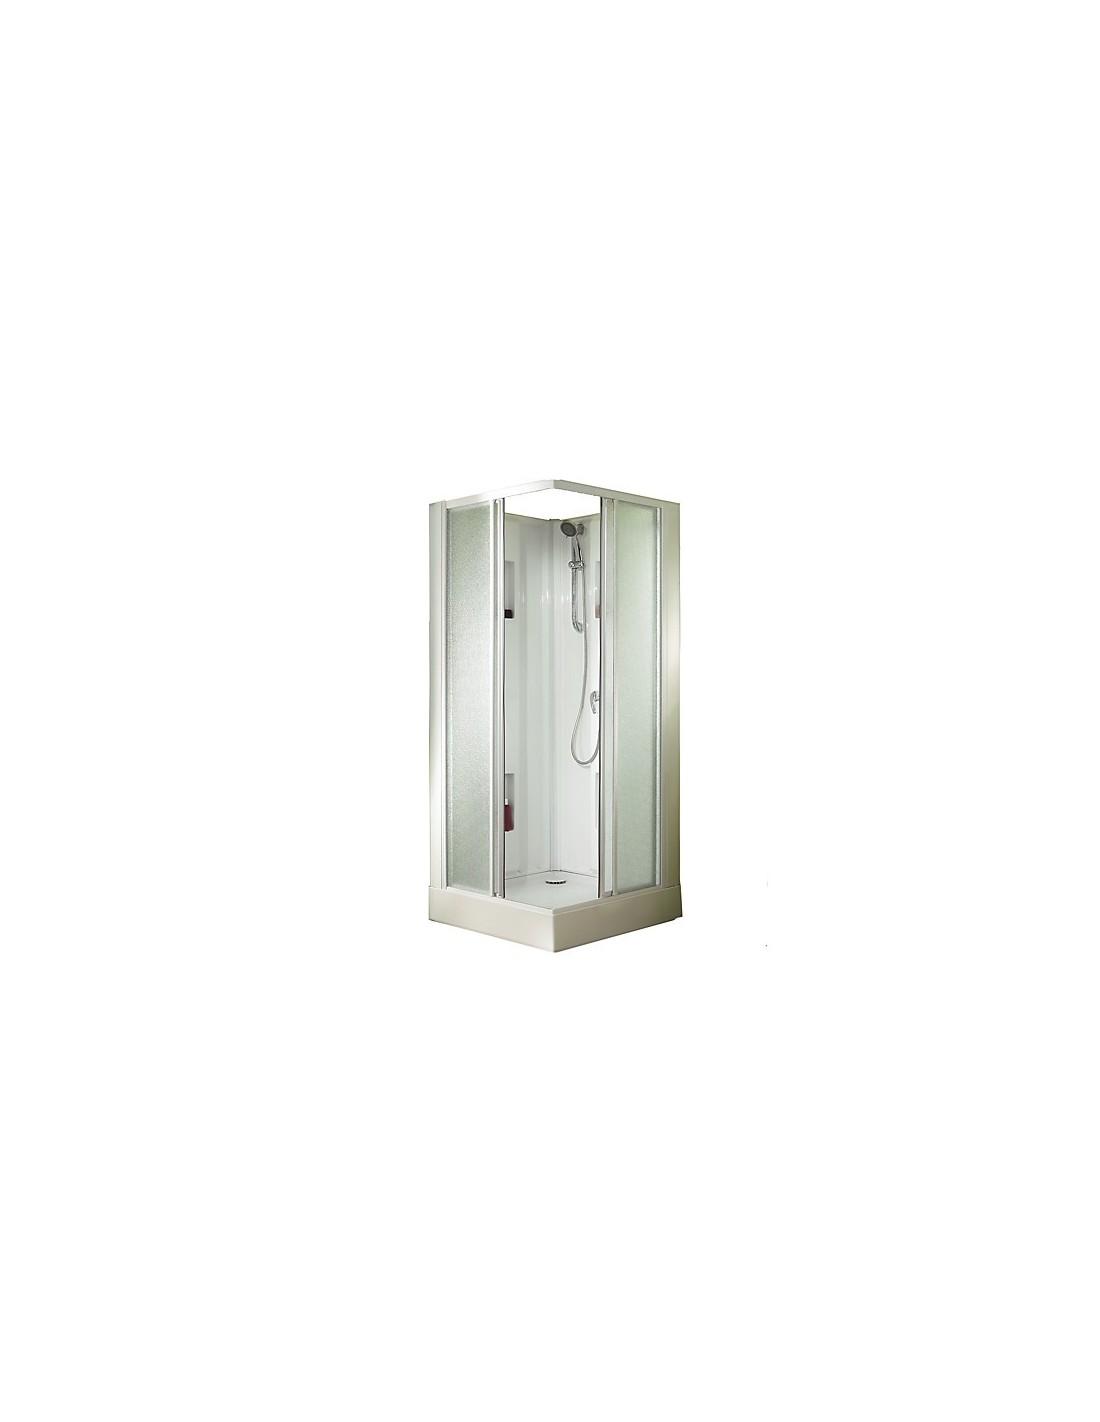 Cabine de douche 90x90 izibox carr e porte coulissante leda for Porte de douche 90x90